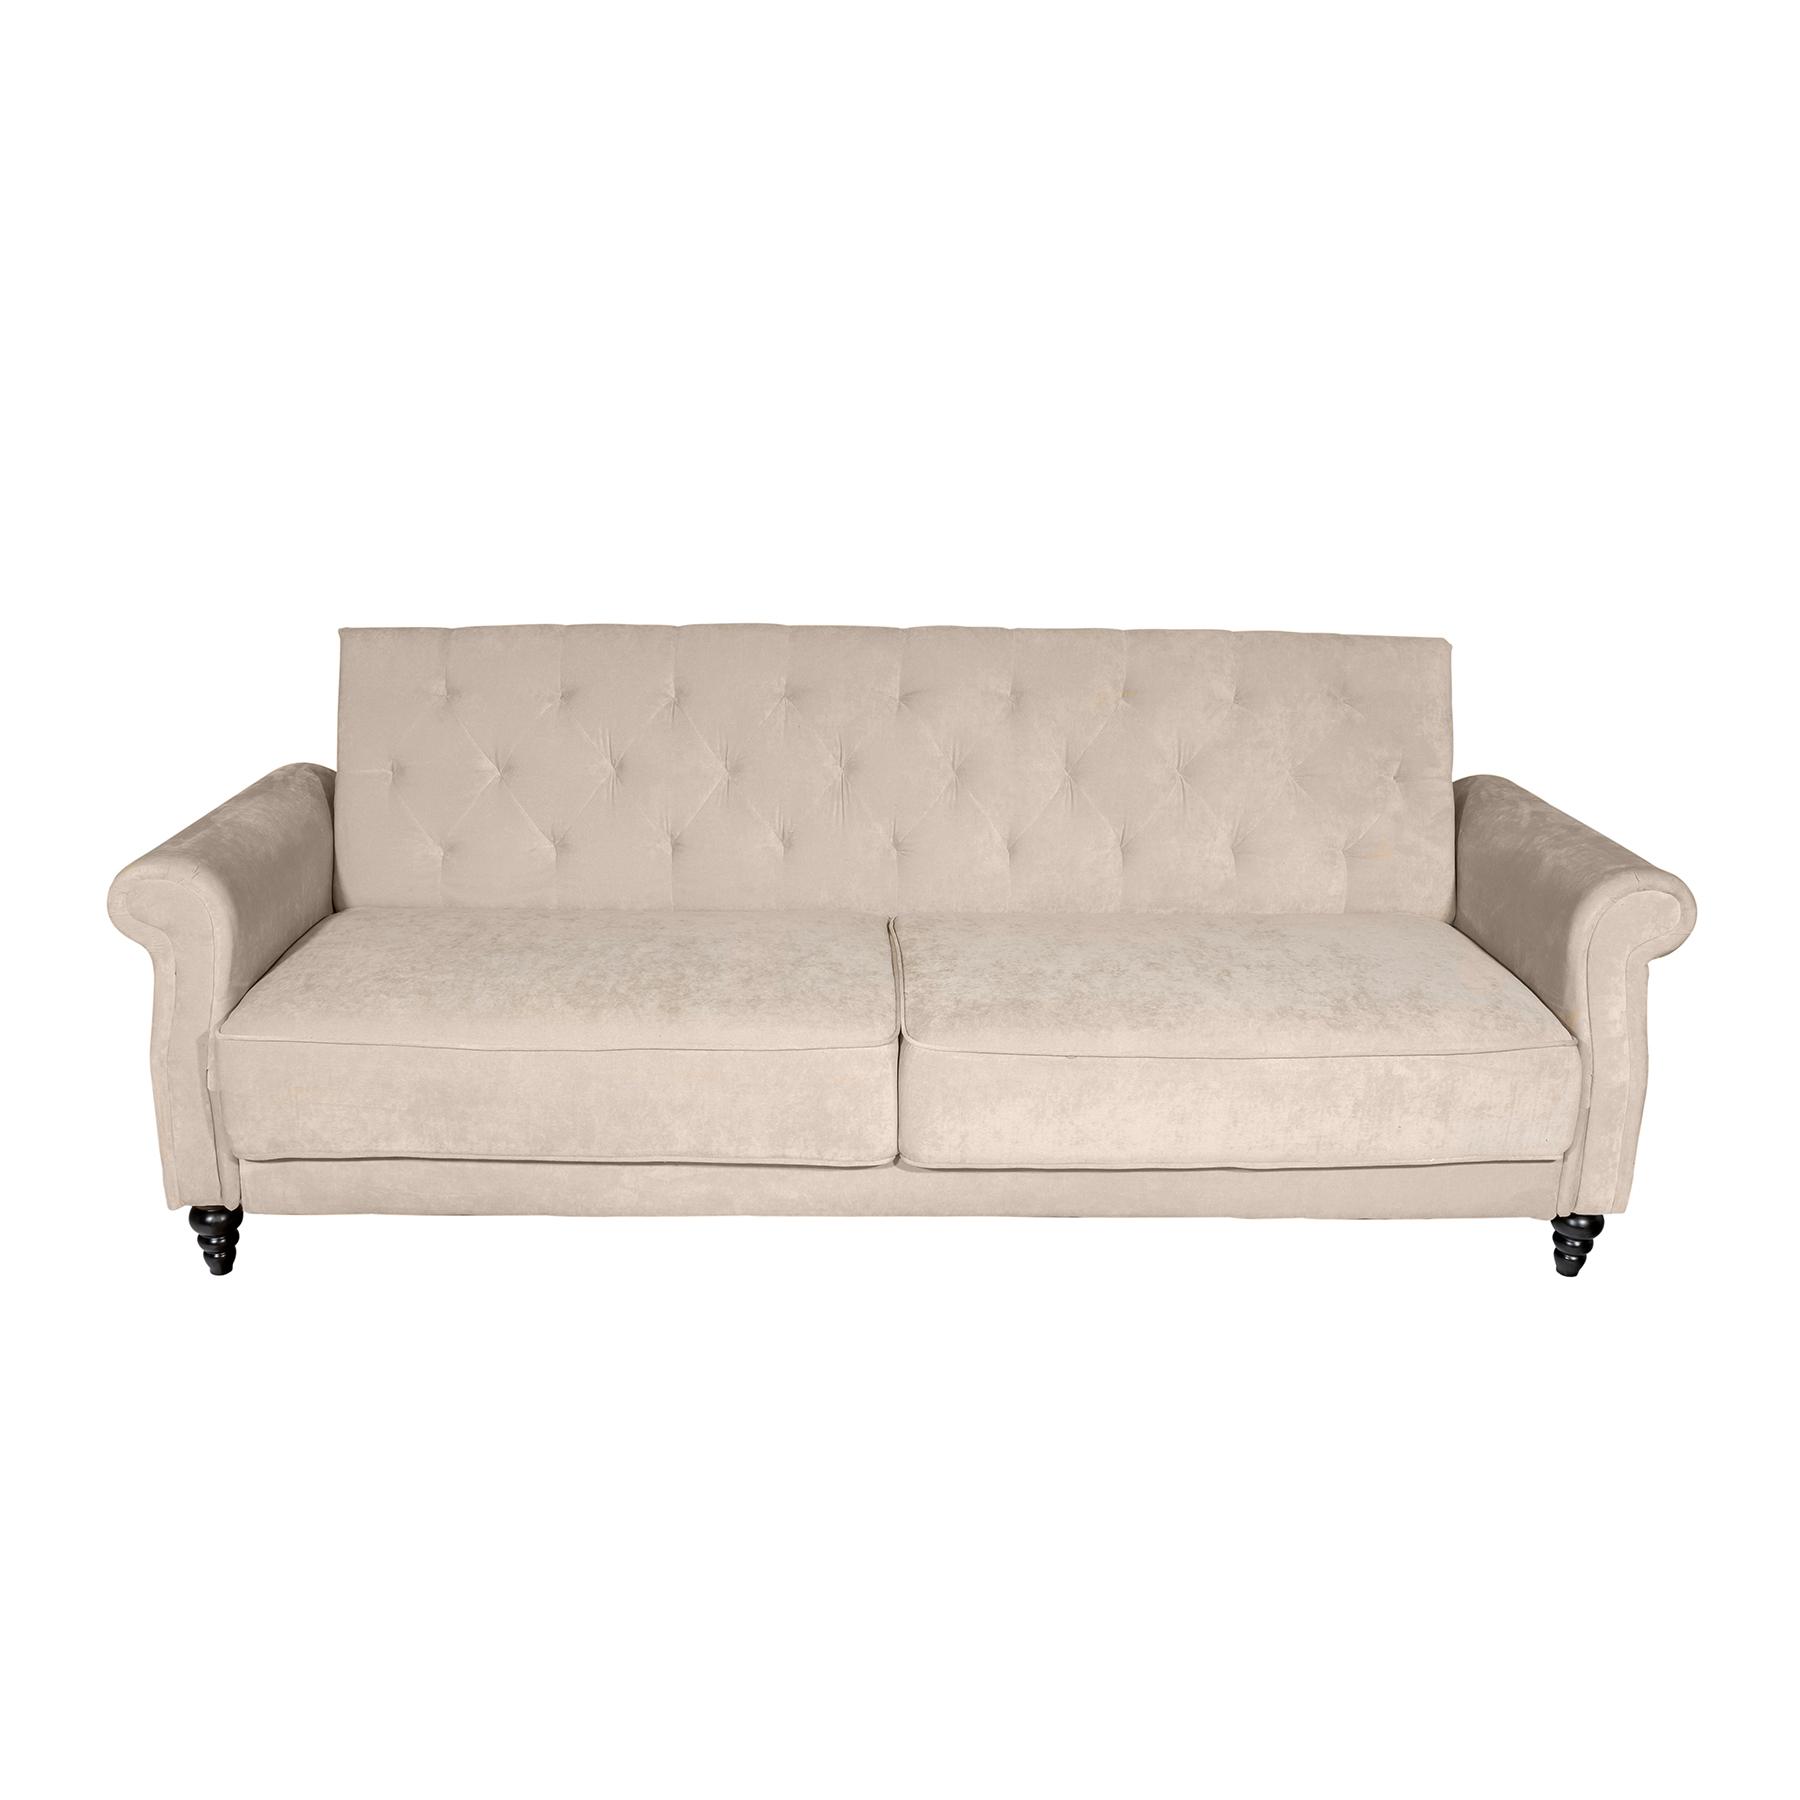 Купить диван 190 см раскладушку